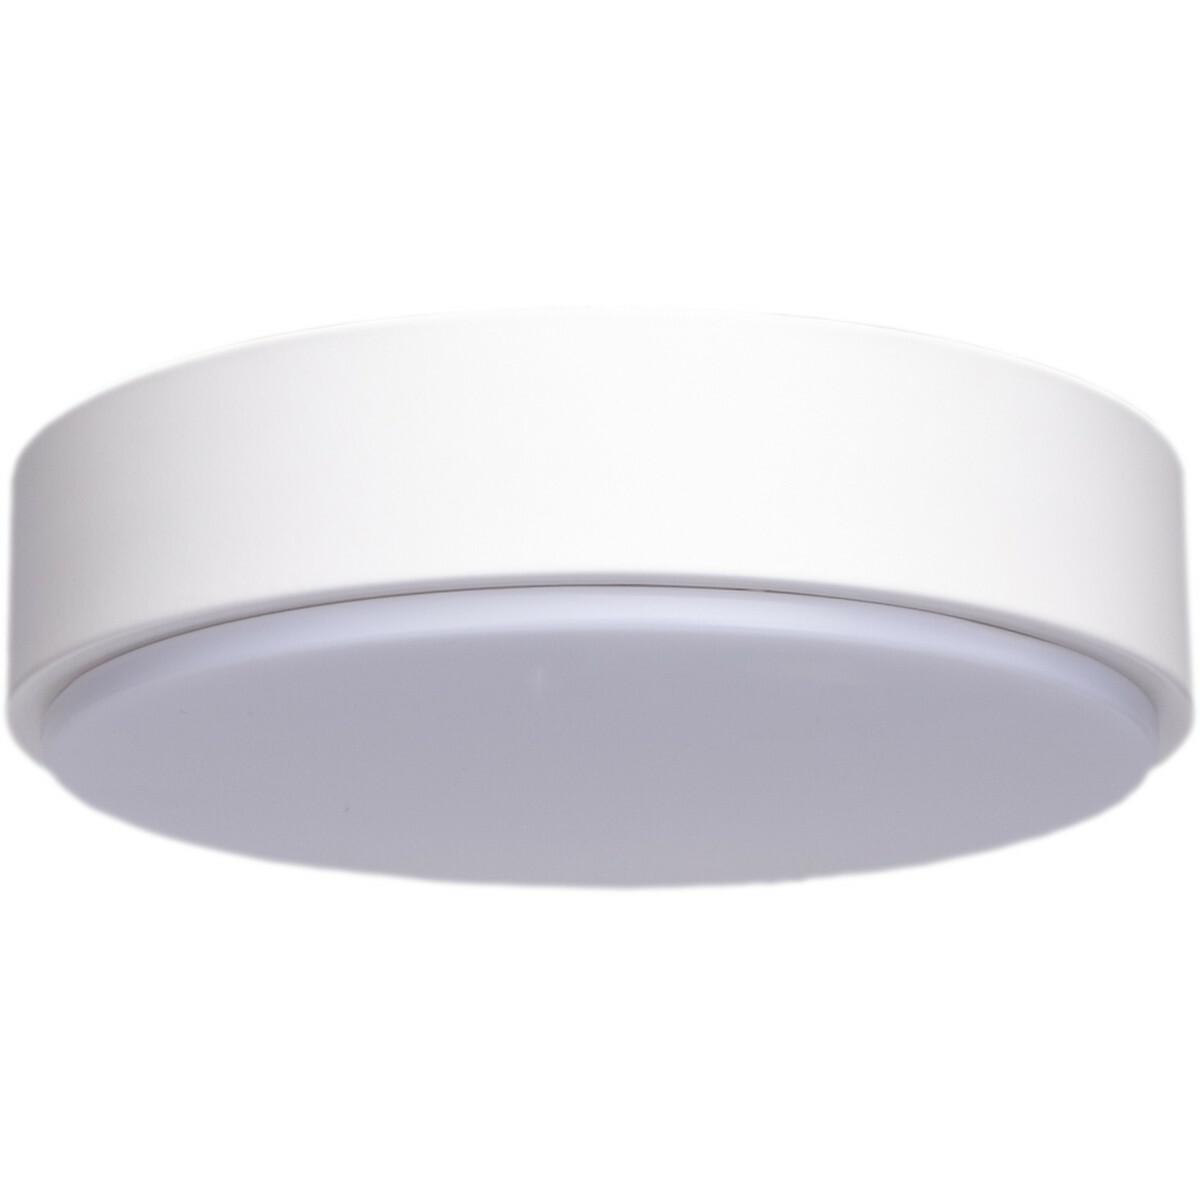 LED Plafondlamp - Aigi Santi - Opbouw Rond 24W - Warm Wit 3000K - Mat Wit - Aluminium